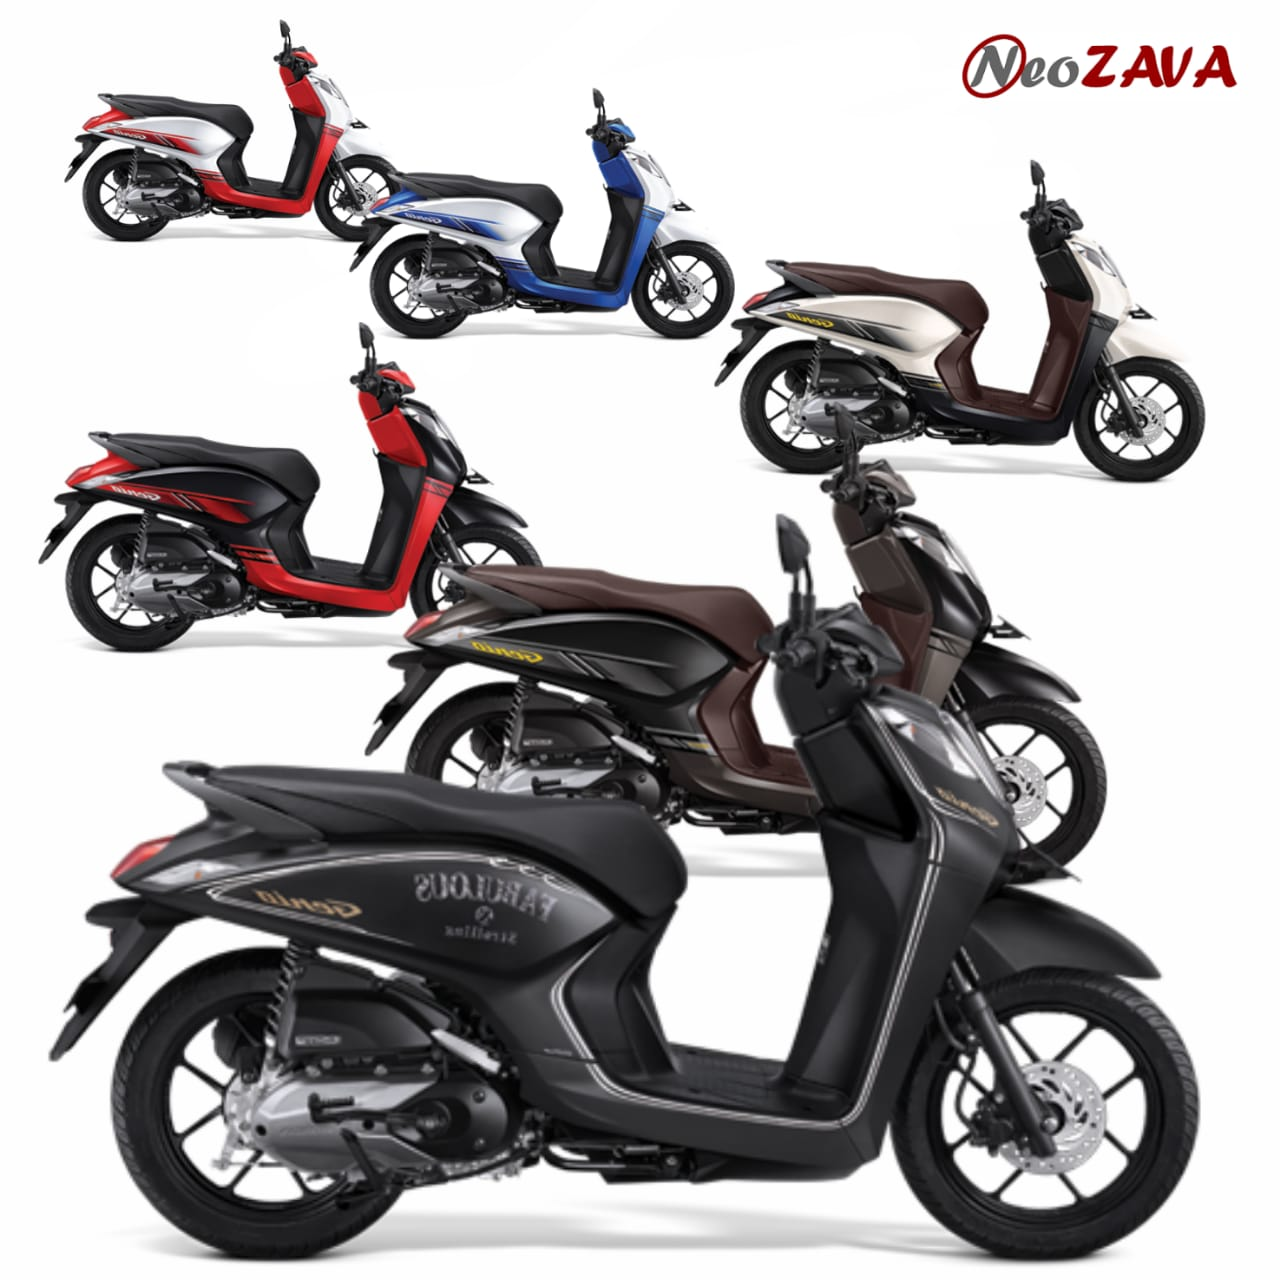 Honda genio 2020